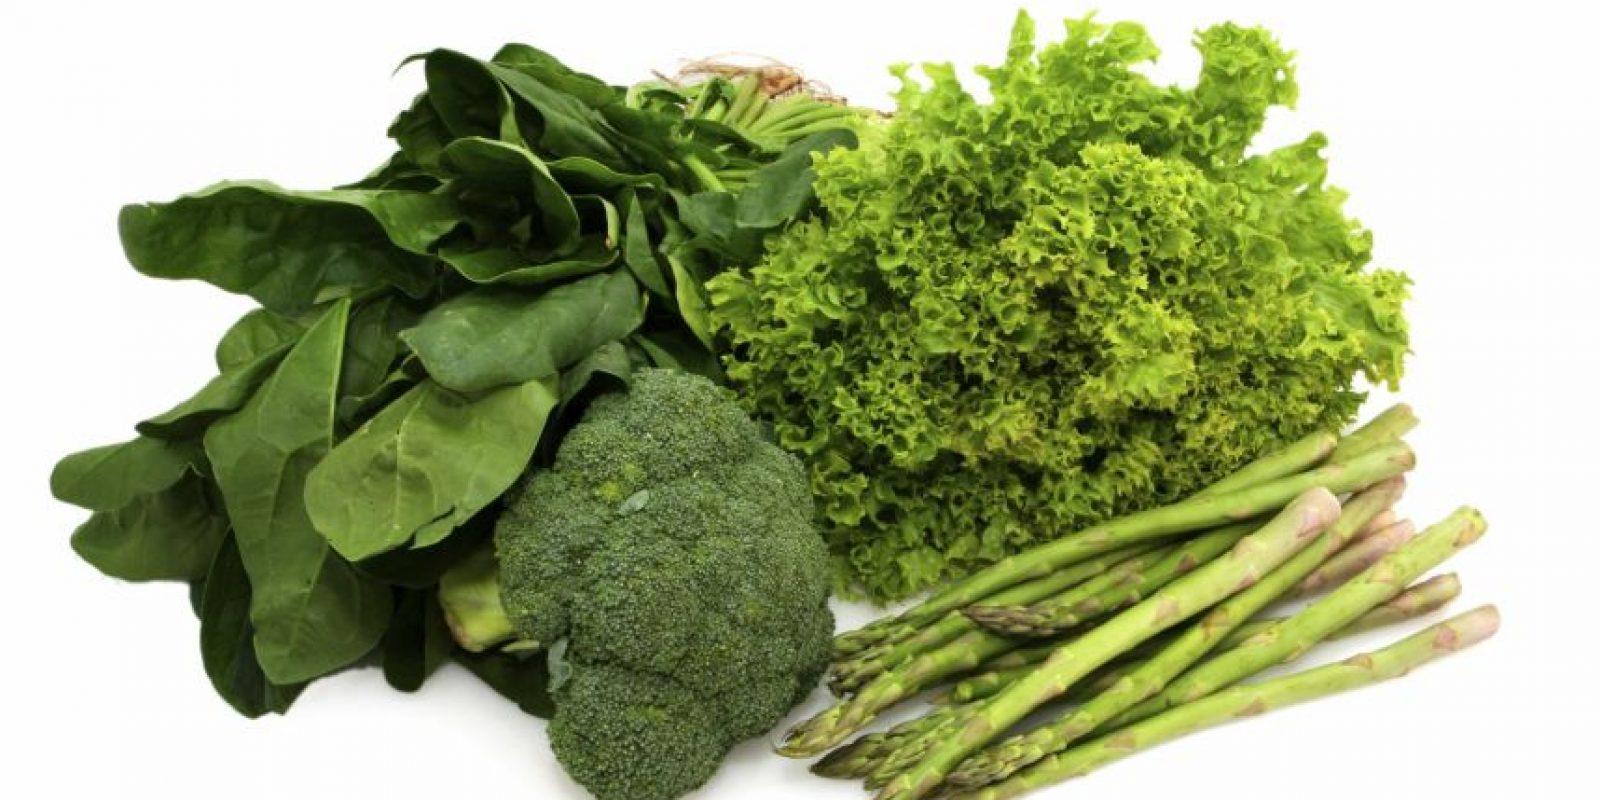 Verduras de hojas verdes Foto:Fuente Externa